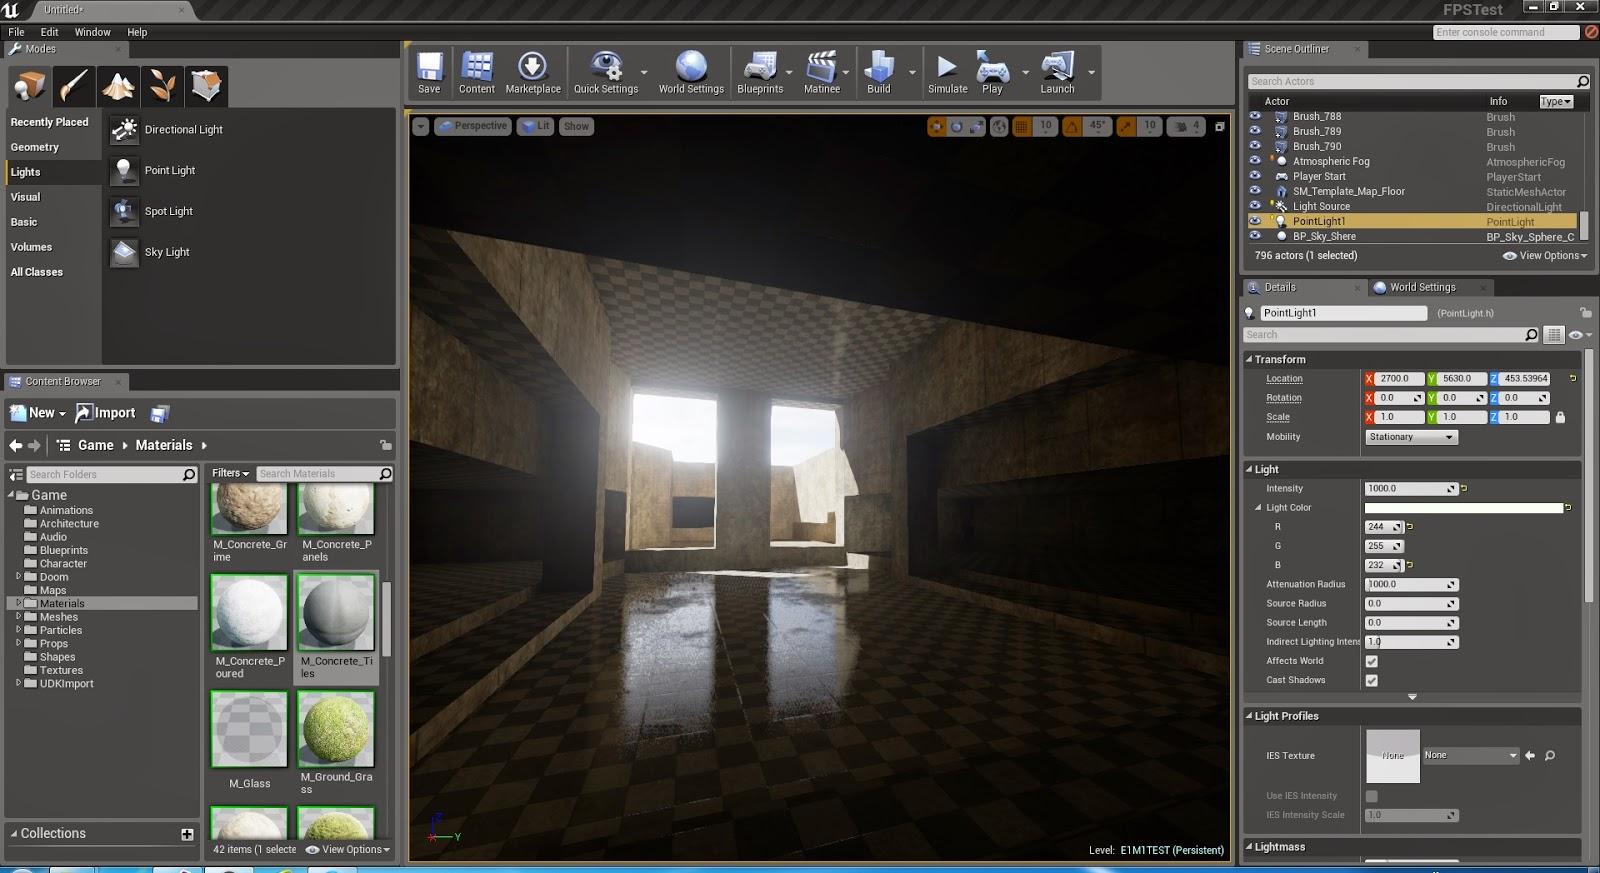 Updating to Unreal Engine 4! news - UDK Doom - Mod DB